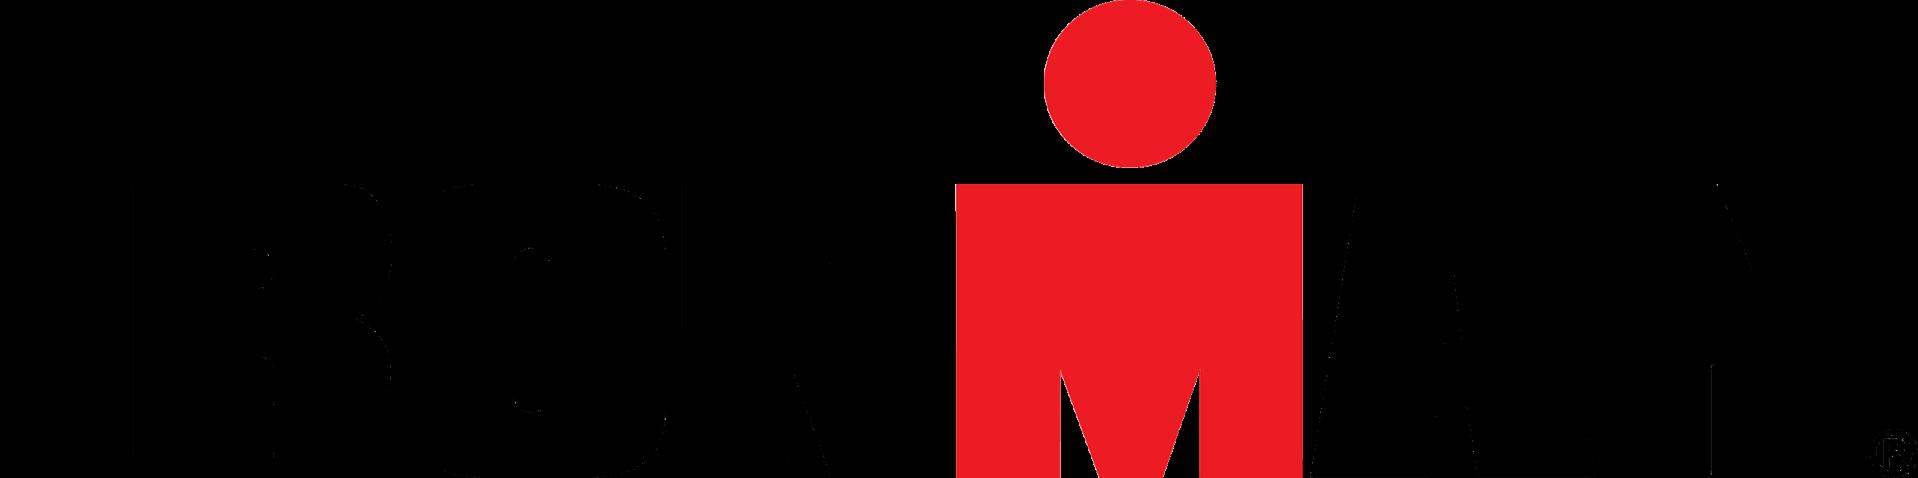 ironman-logo-b